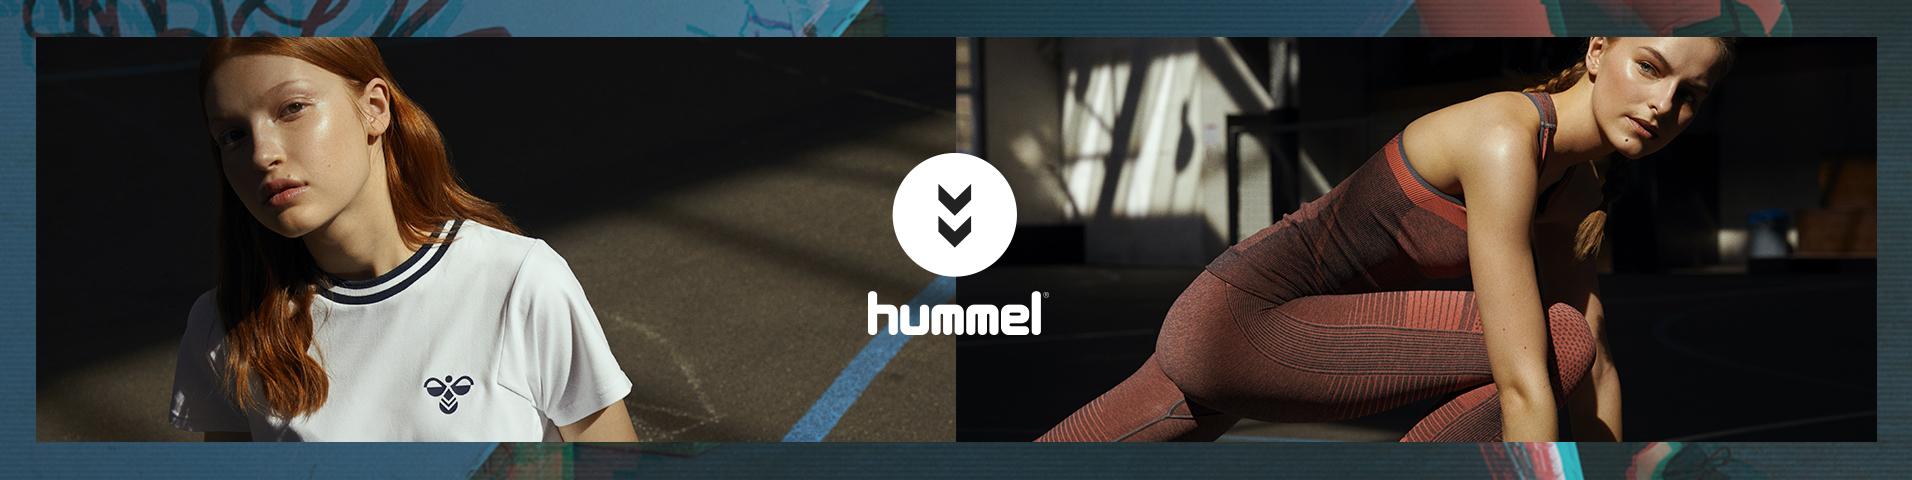 d6d76f2f4f8 Hummel online | Den nye kollektion på Zalando